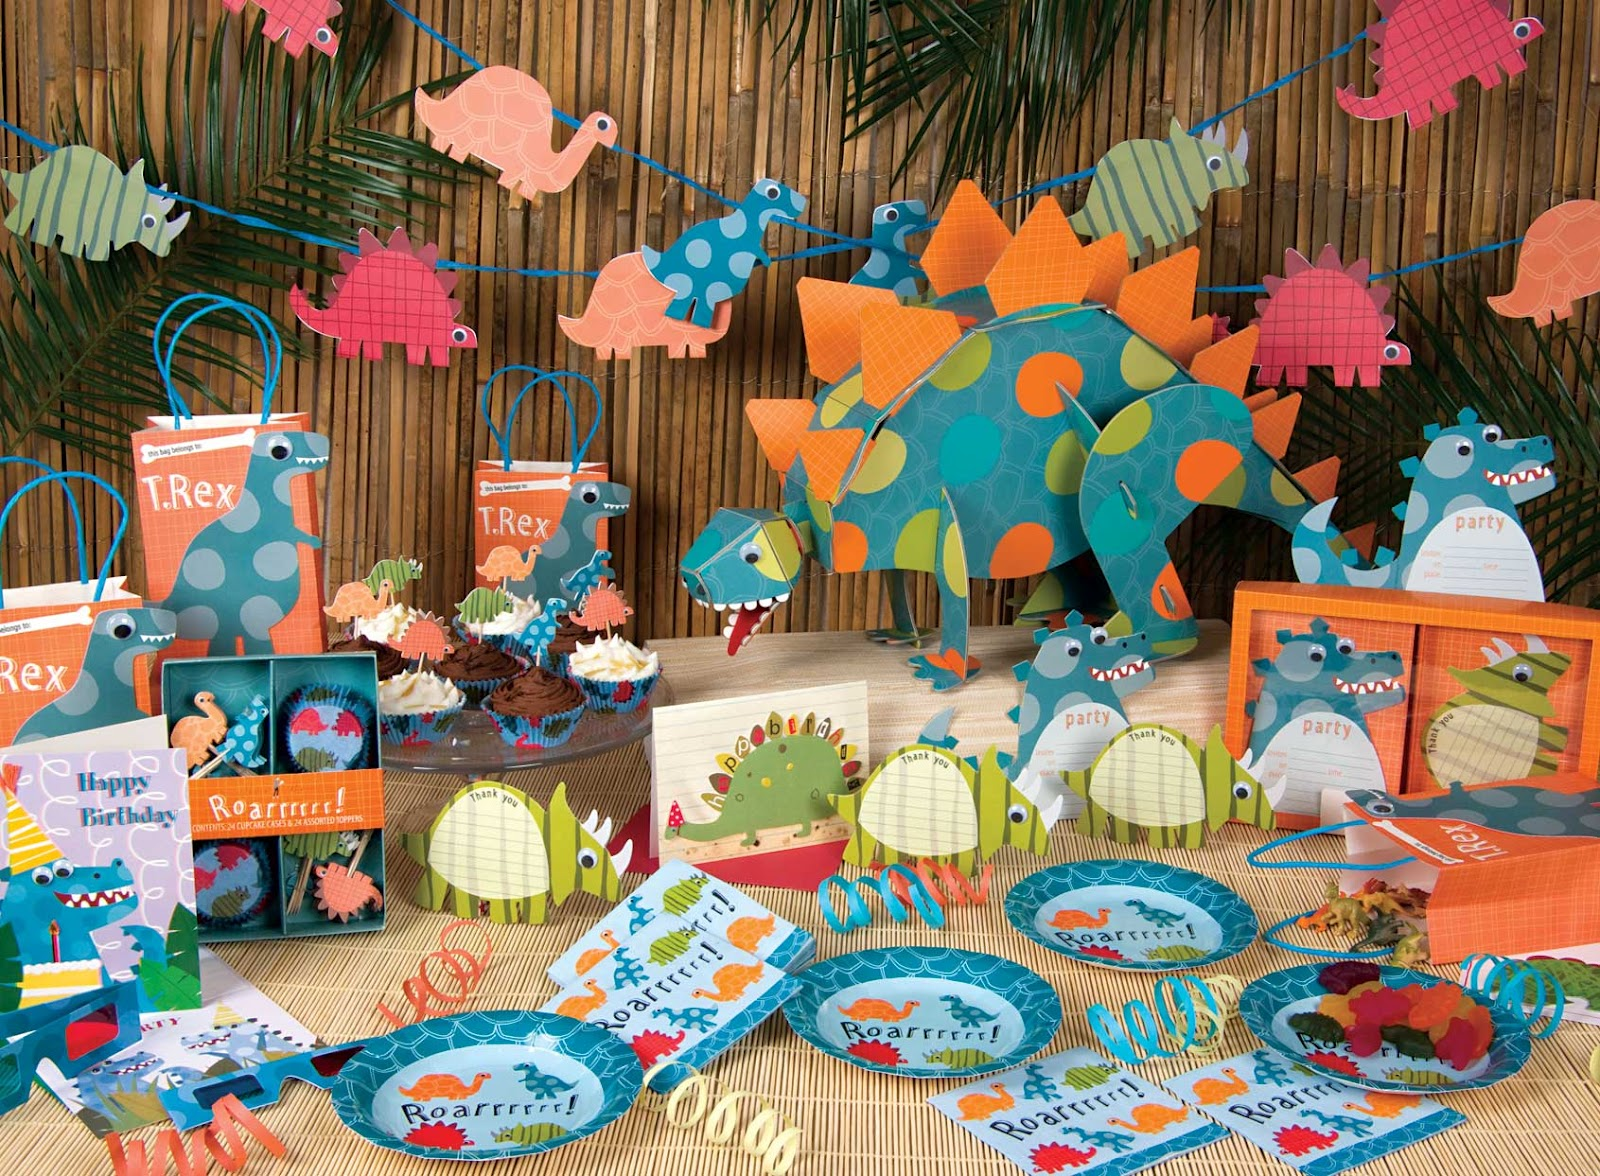 kalliopelp decoraci n de fiestas infantiles de dinosaurios